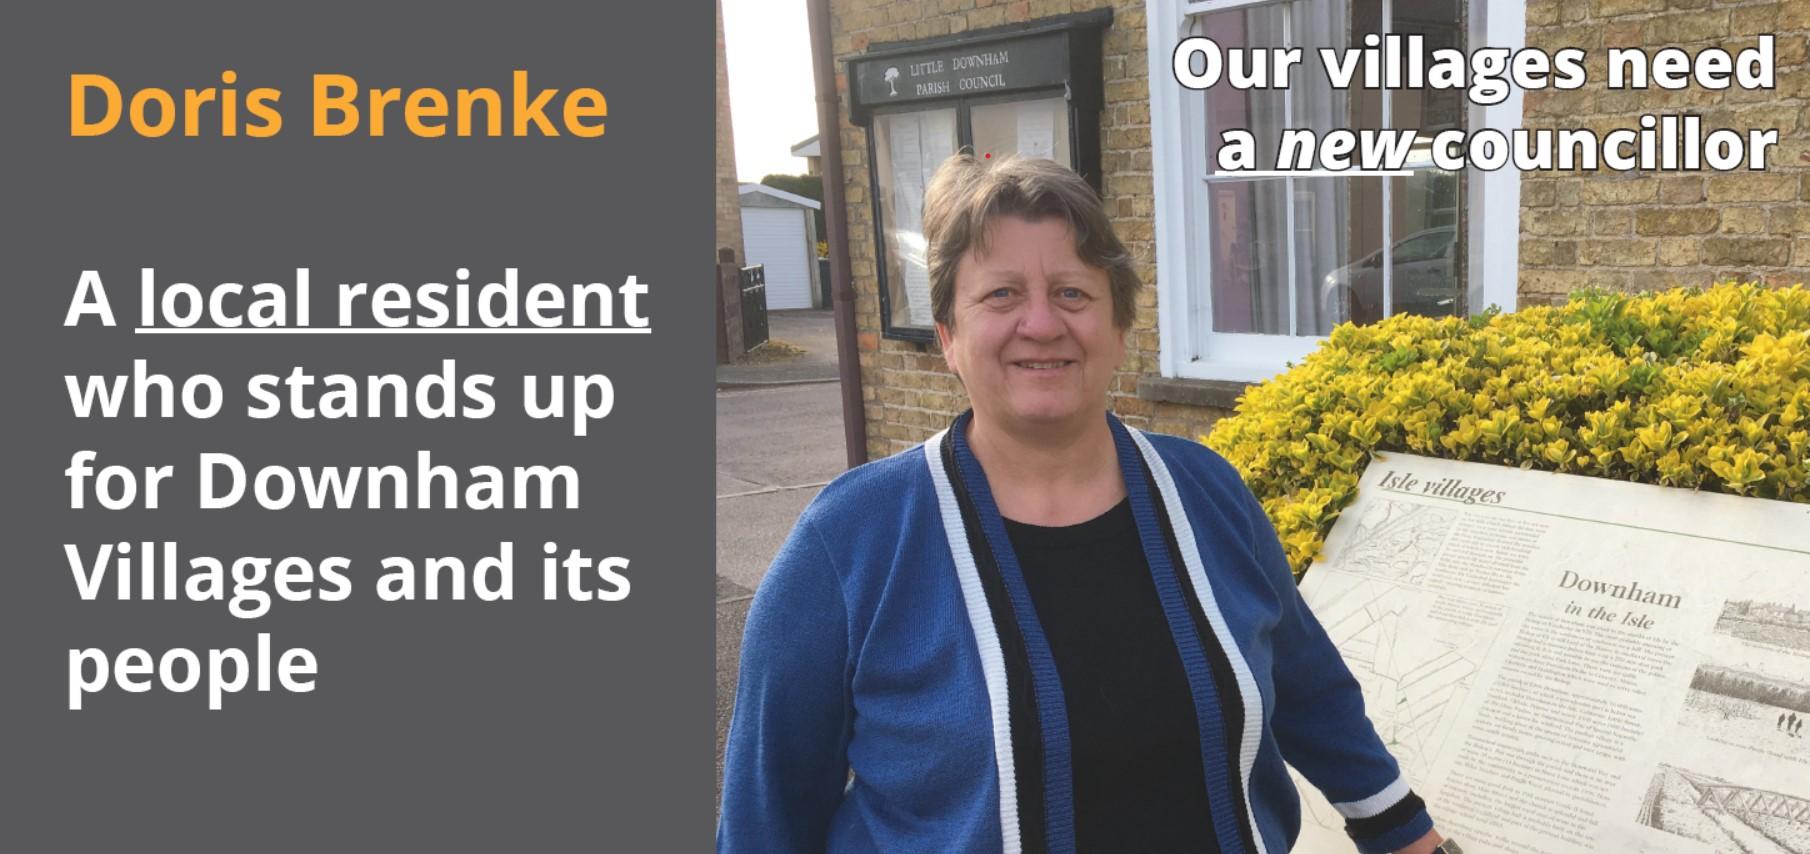 Doris Brenke your Lib Dem Candidate for Downham Villages